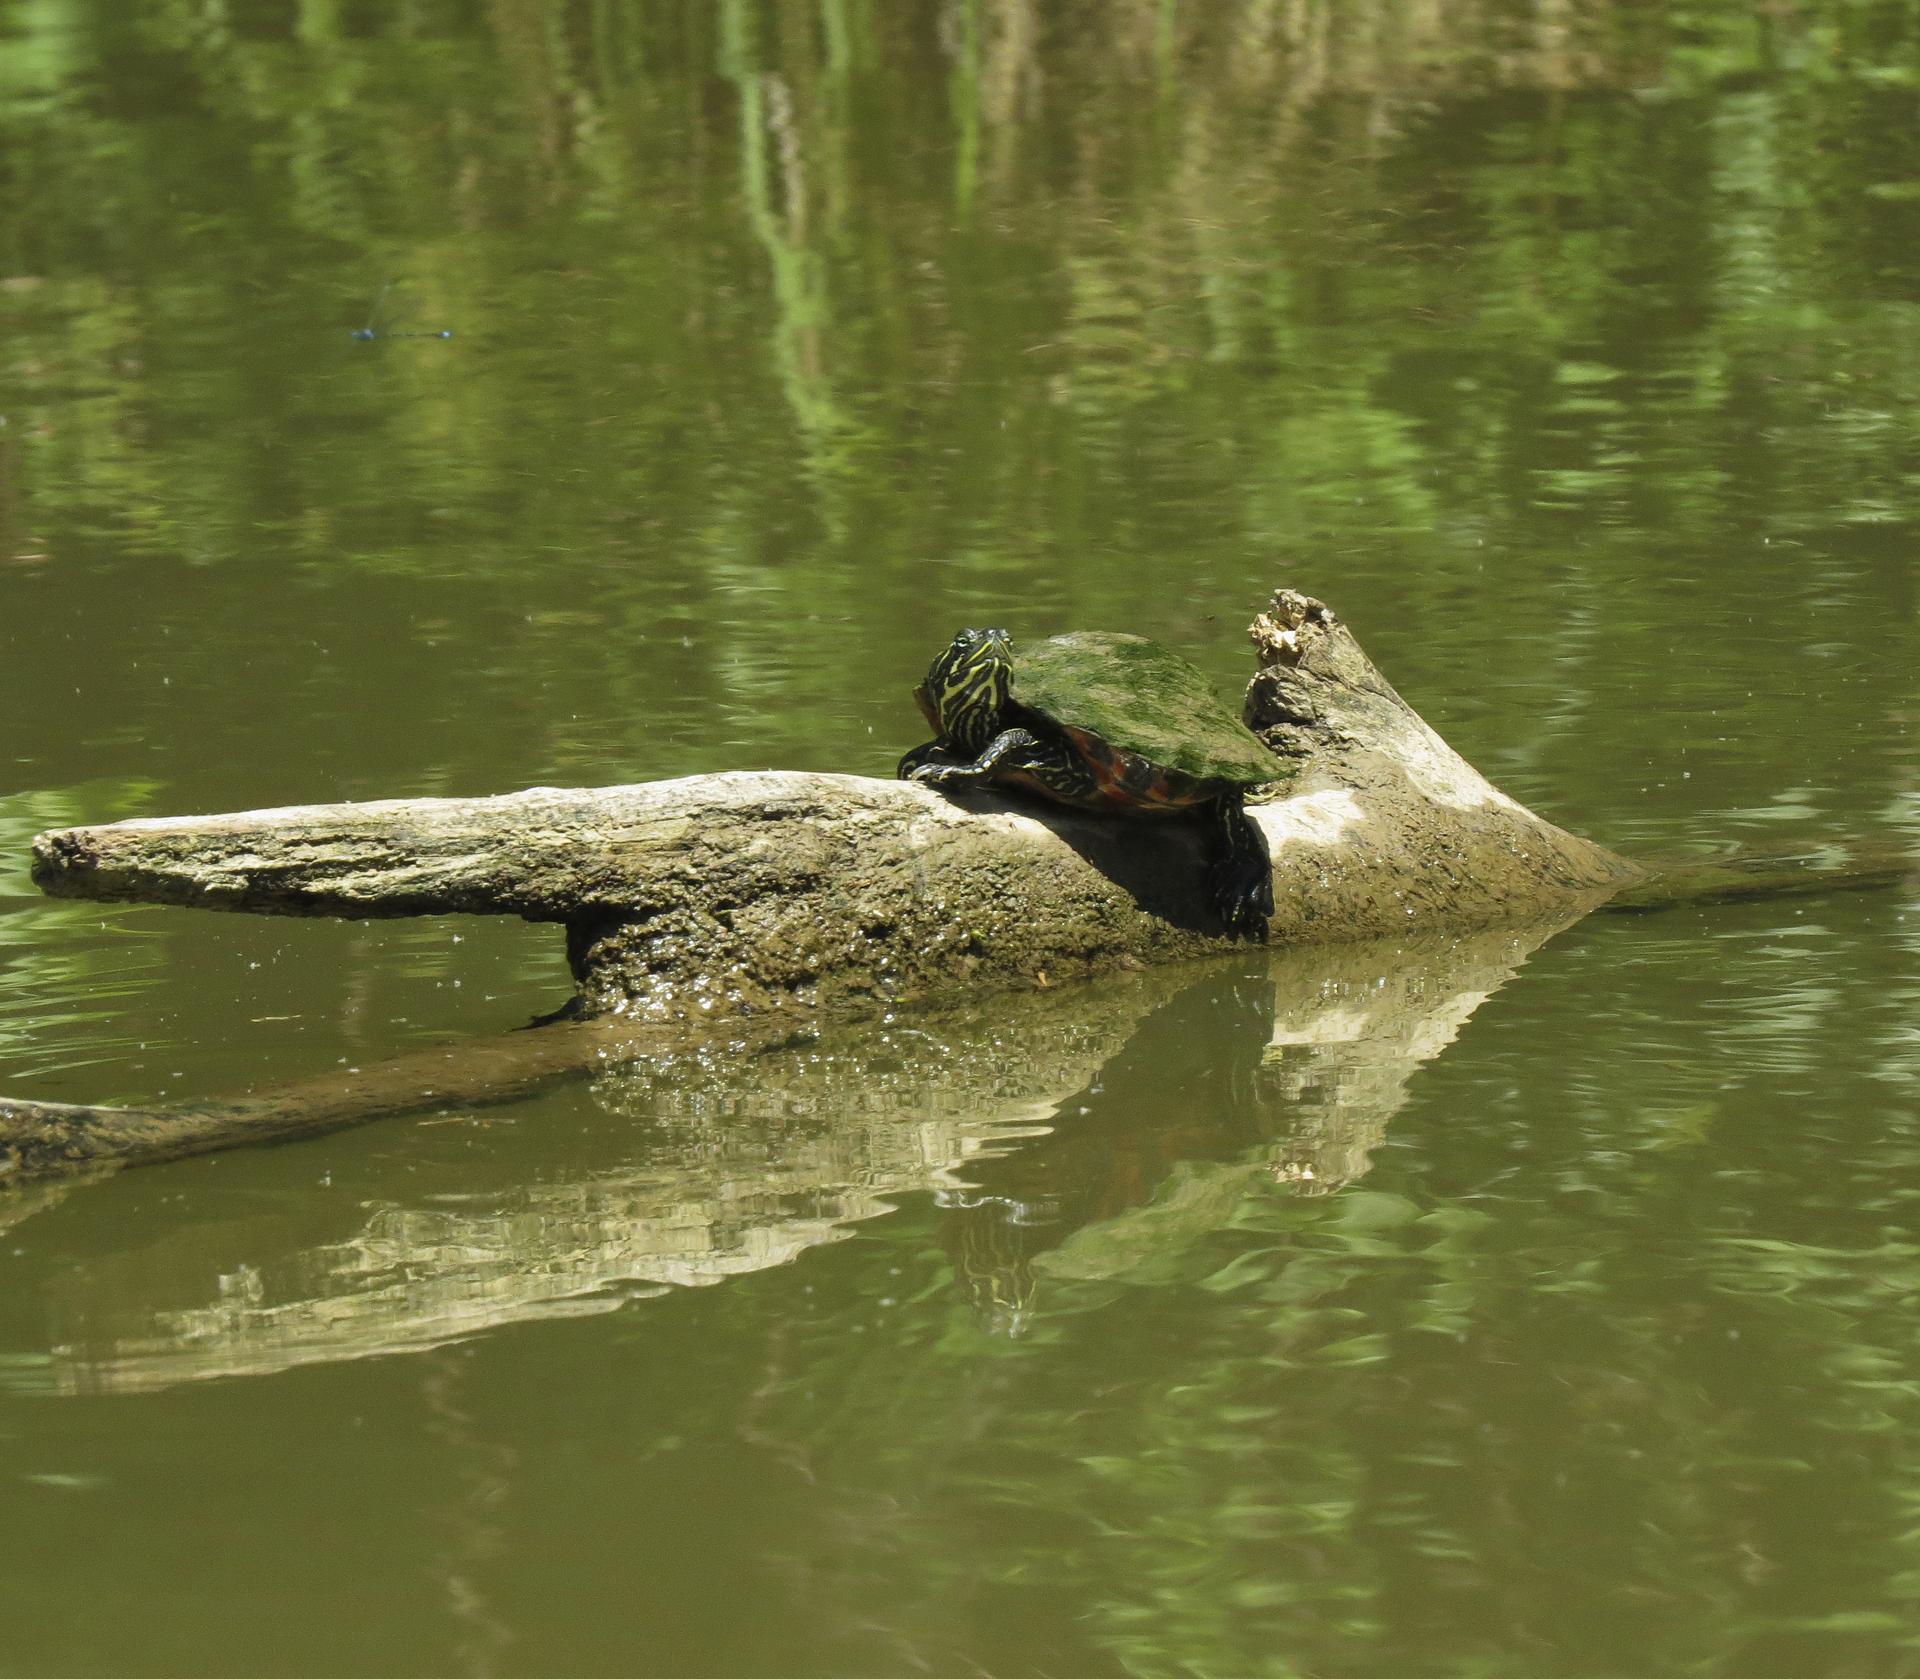 turtle river nature kayaking maryland